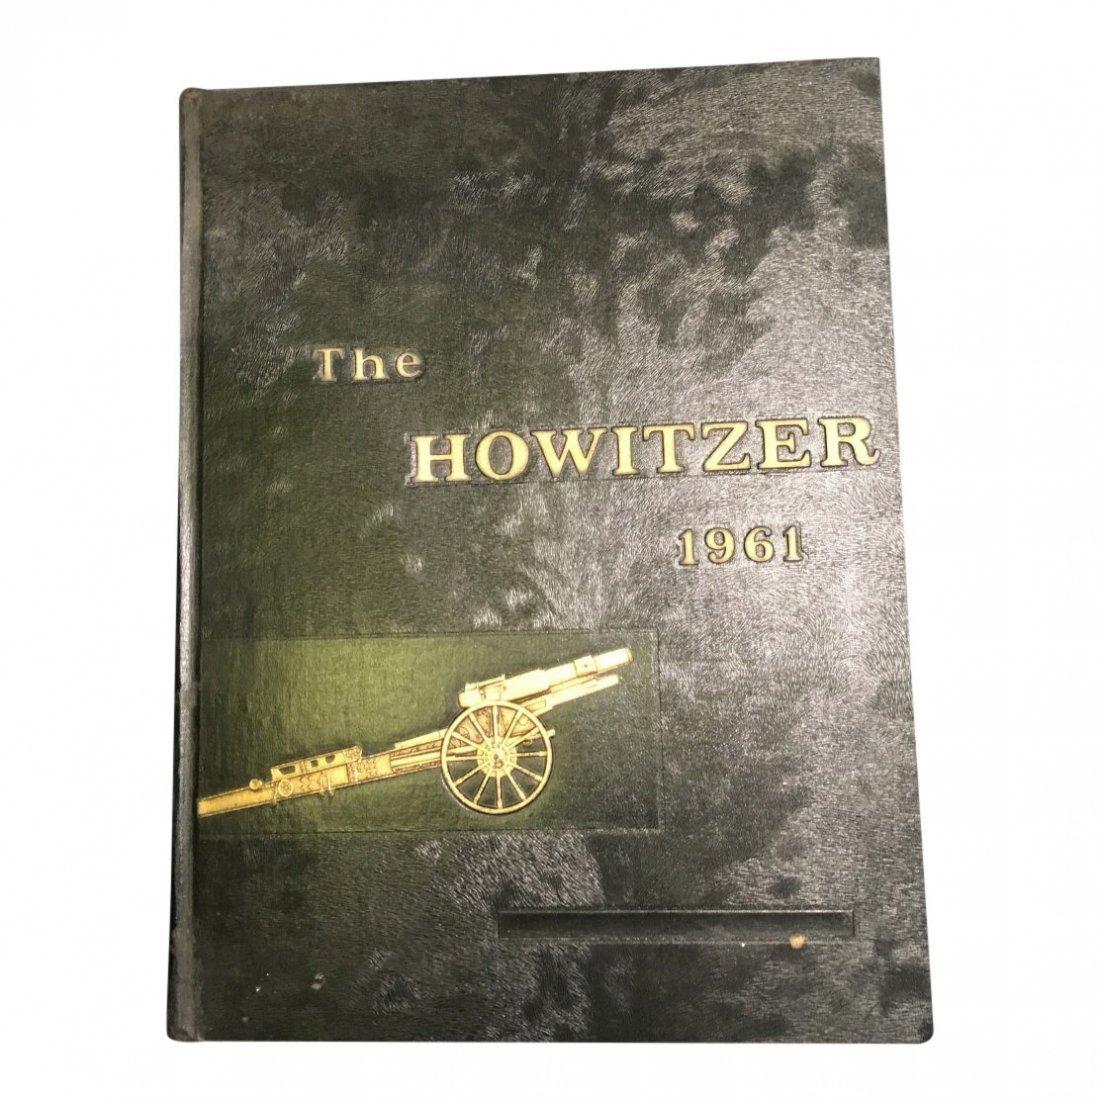 The Howitzer, 1961